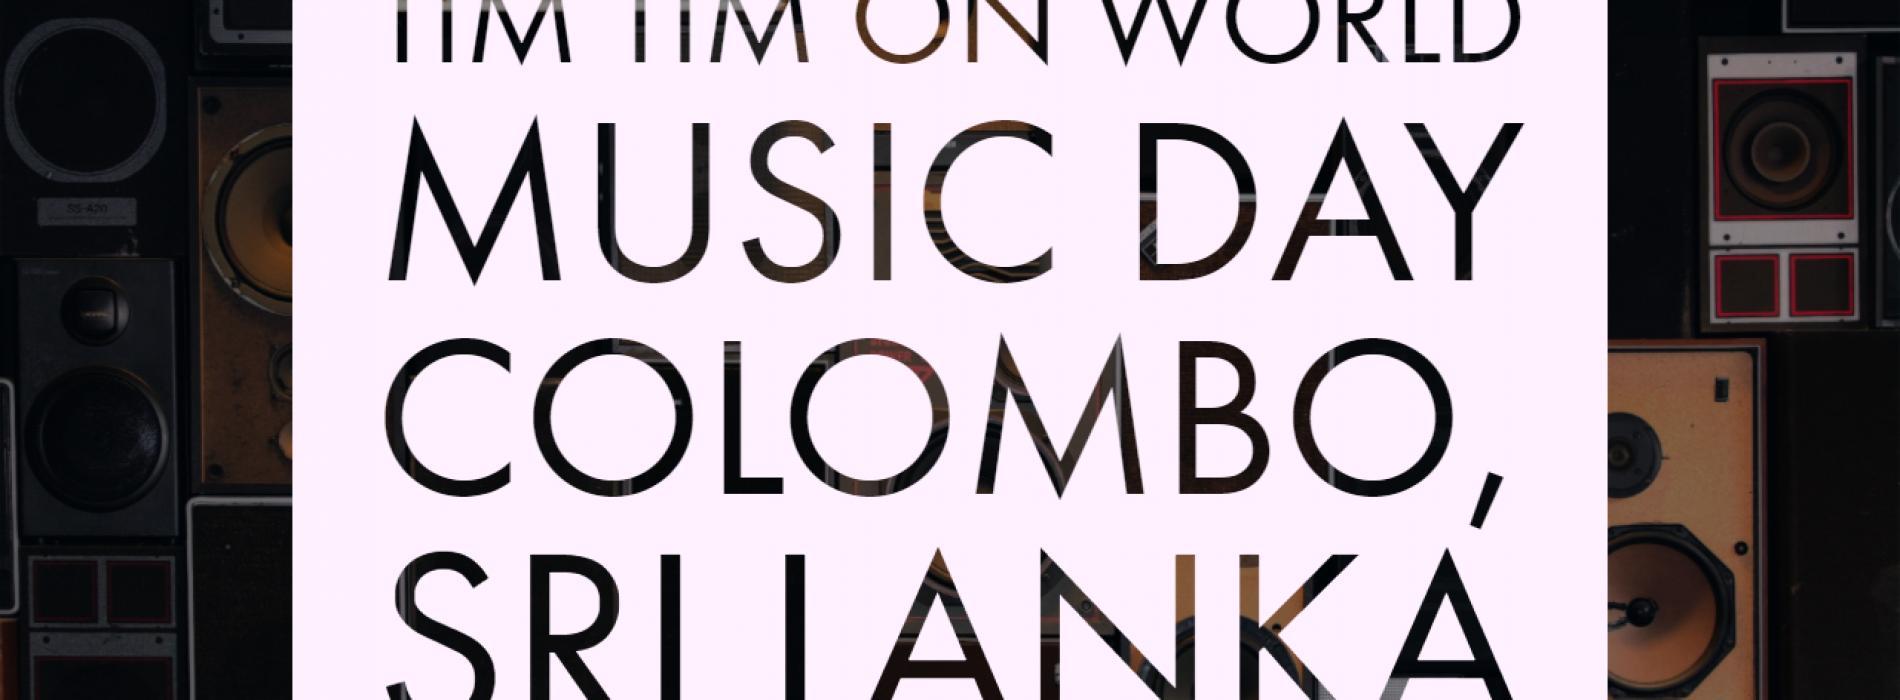 Tim Tim On World Music Day Colombo, Sri Lanka